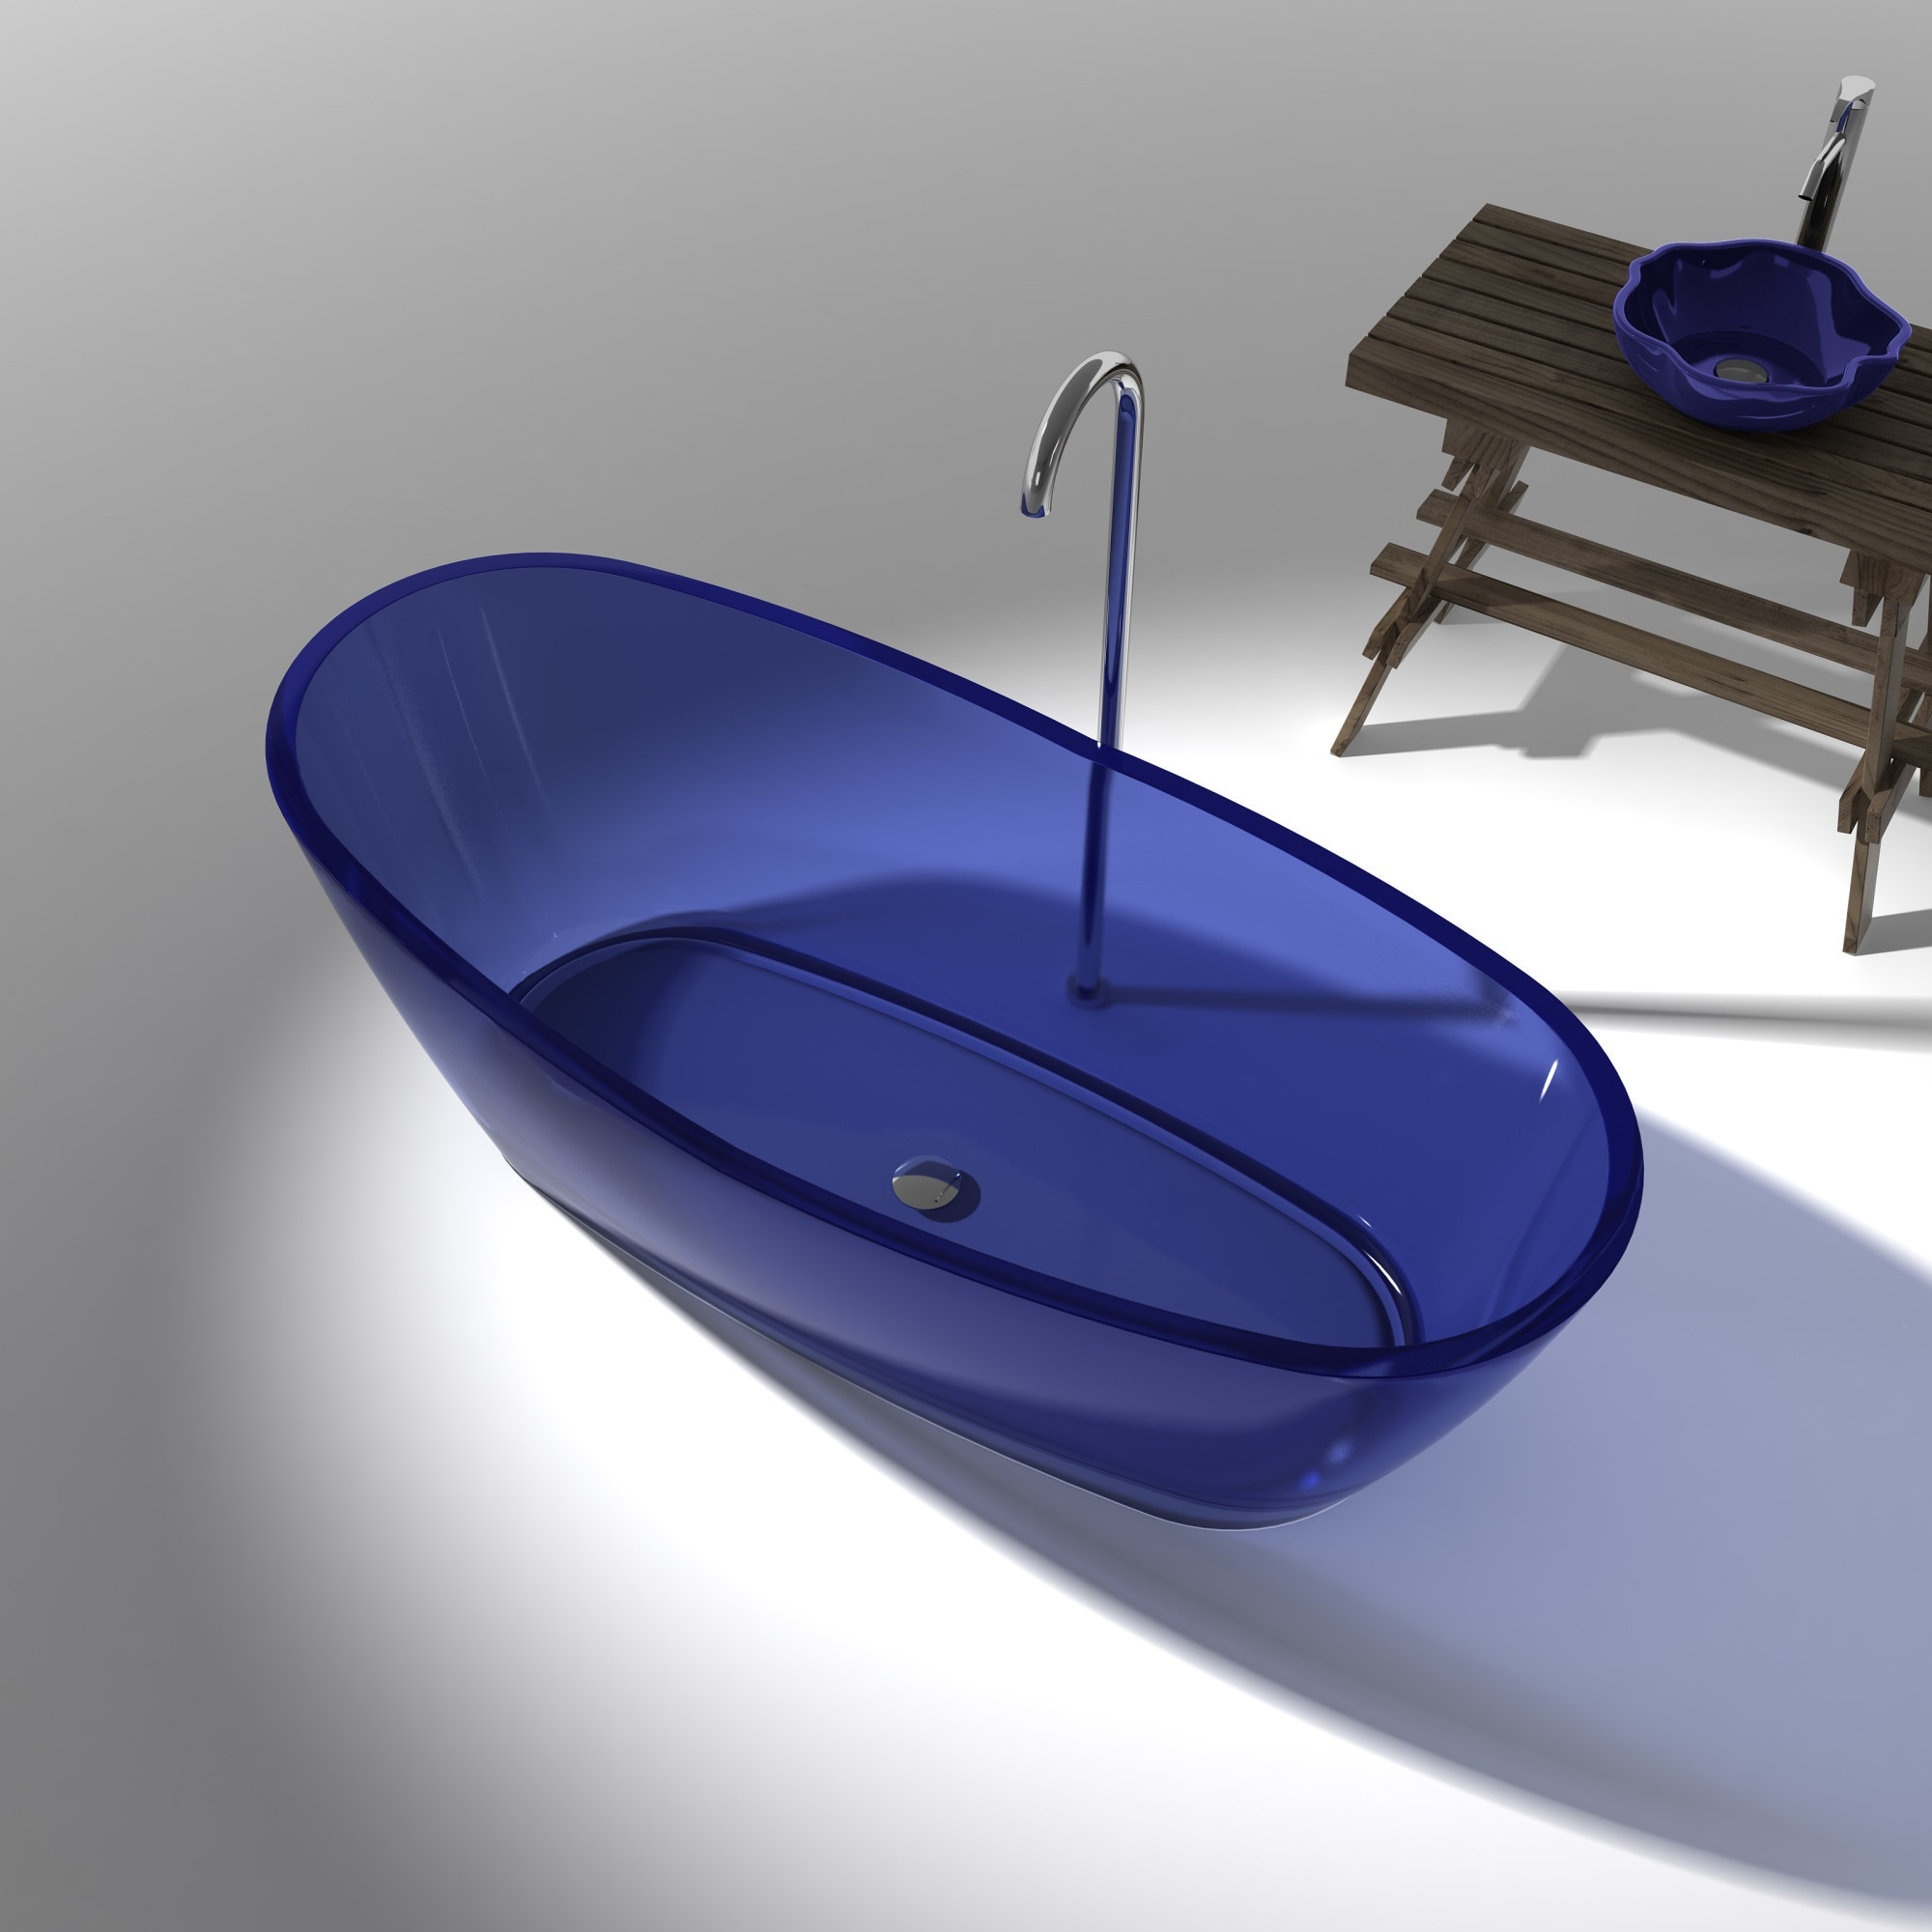 Anzzi Ember 5.4-foot Man-made Stone Slipper Soaker Bathtub in Regal ...